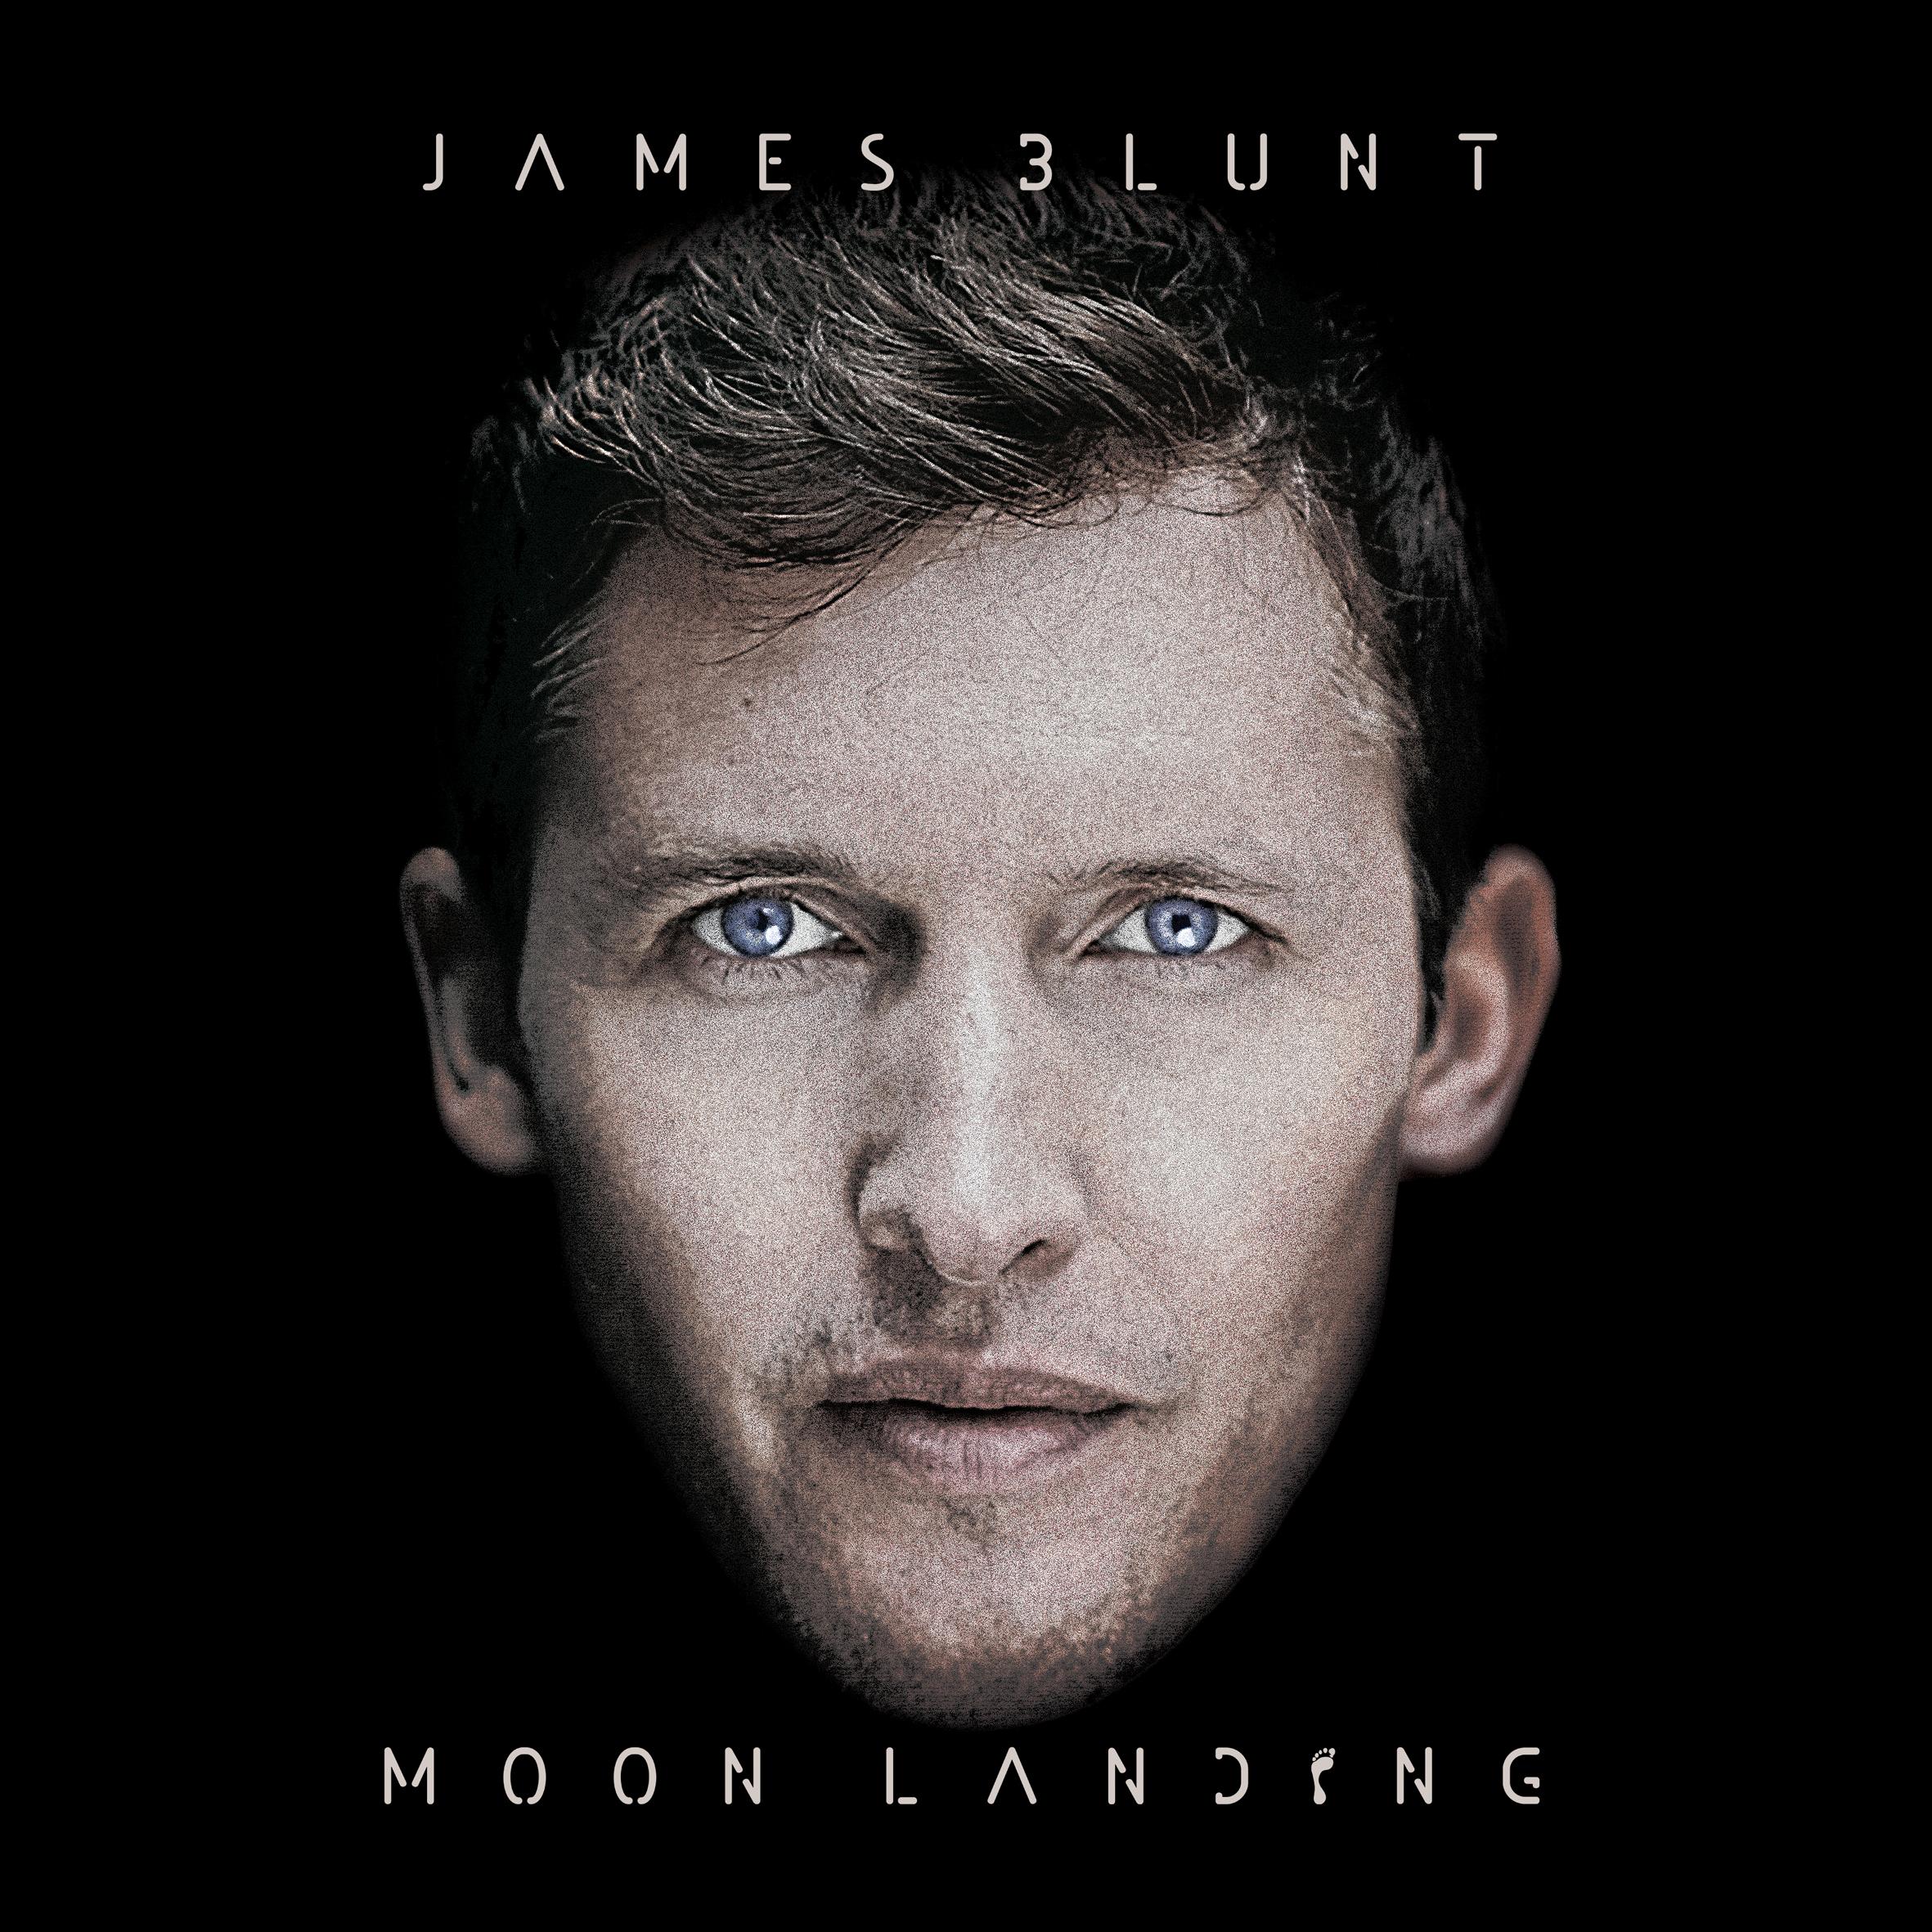 James Blunt: végre itt az album